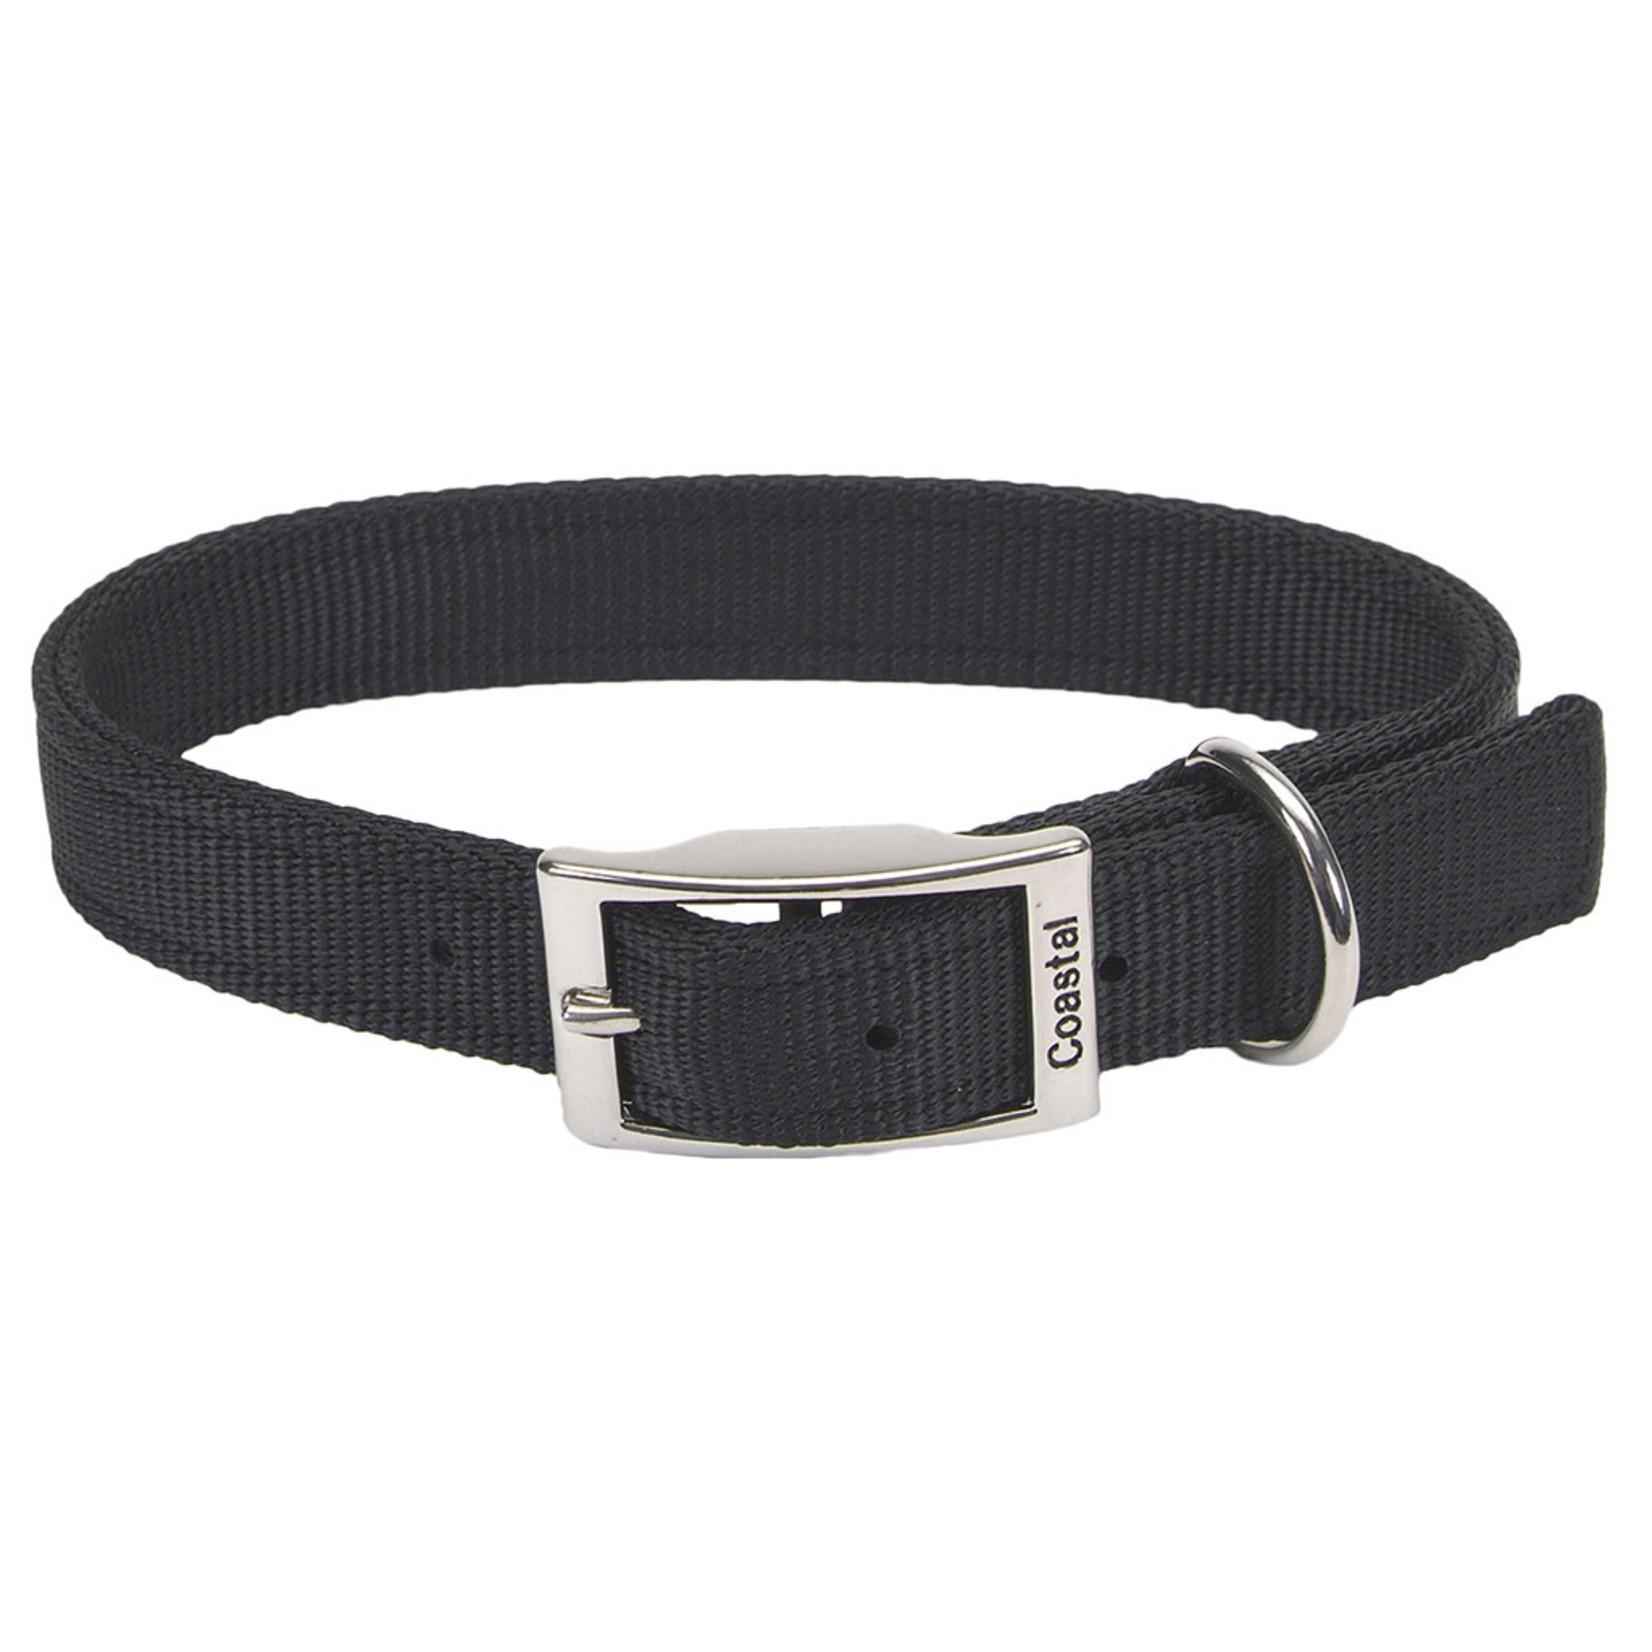 Coastal Coastal Black Belt Collar  22x1''